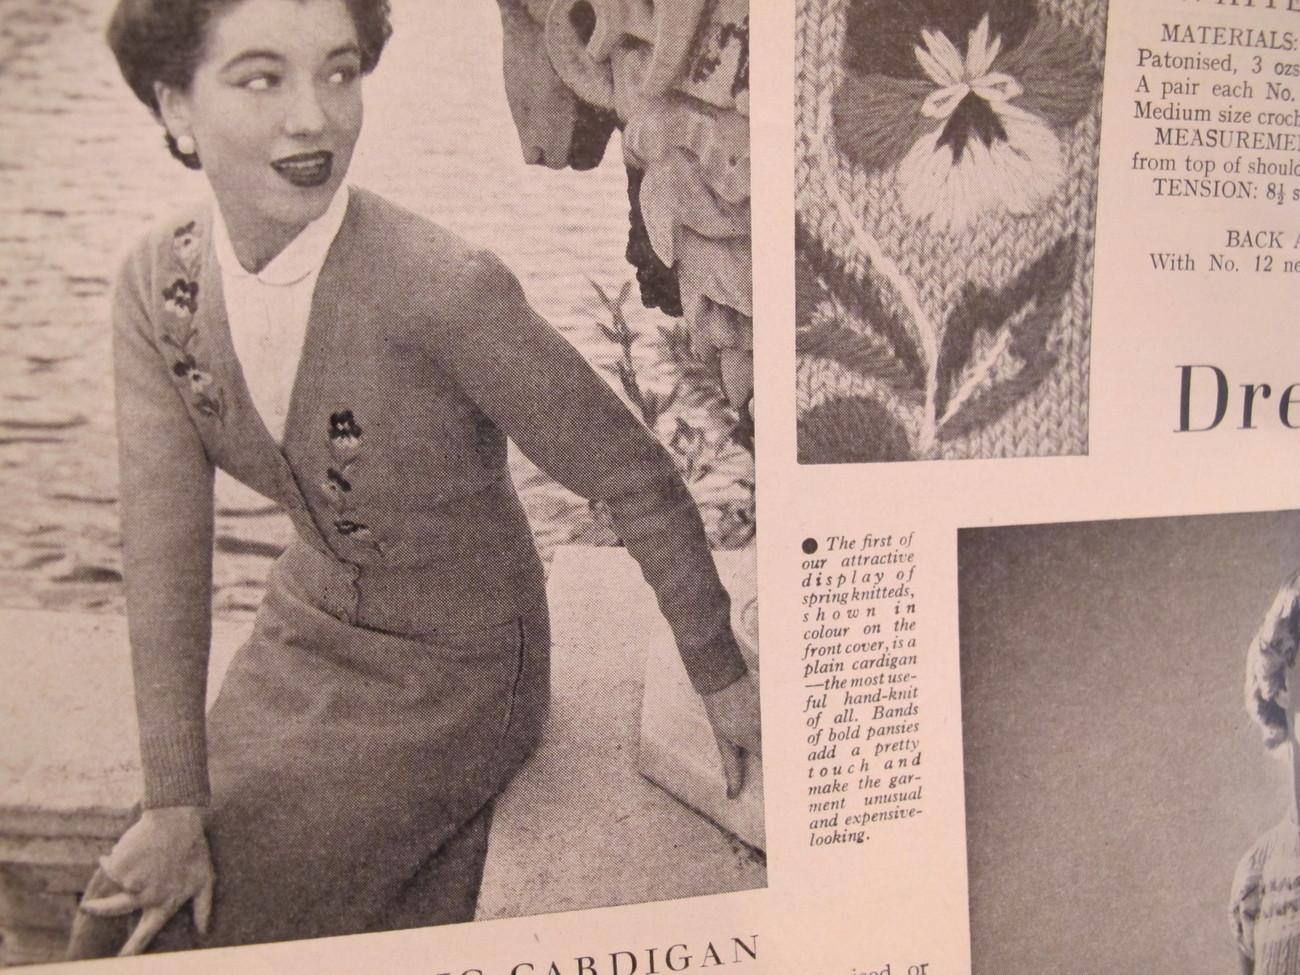 Vintage Stitchcraft Patterns Knitting Jacobean Cushion Cutwork Recipes etc